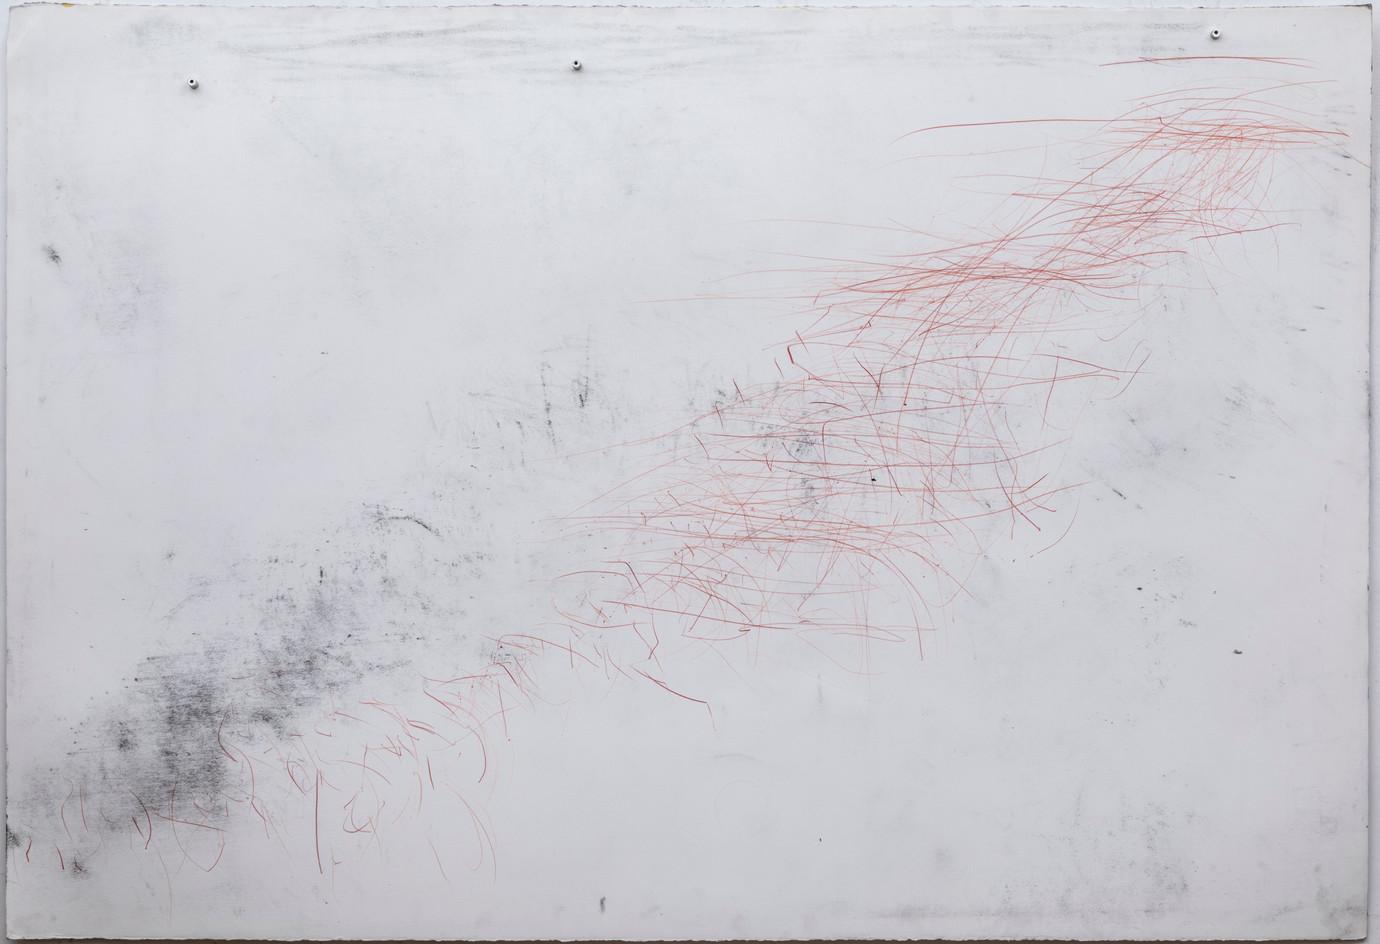 104 x 152 cm lápis dermatográfico, giz pastel seco sobre papel foto: Ruy Teixeira